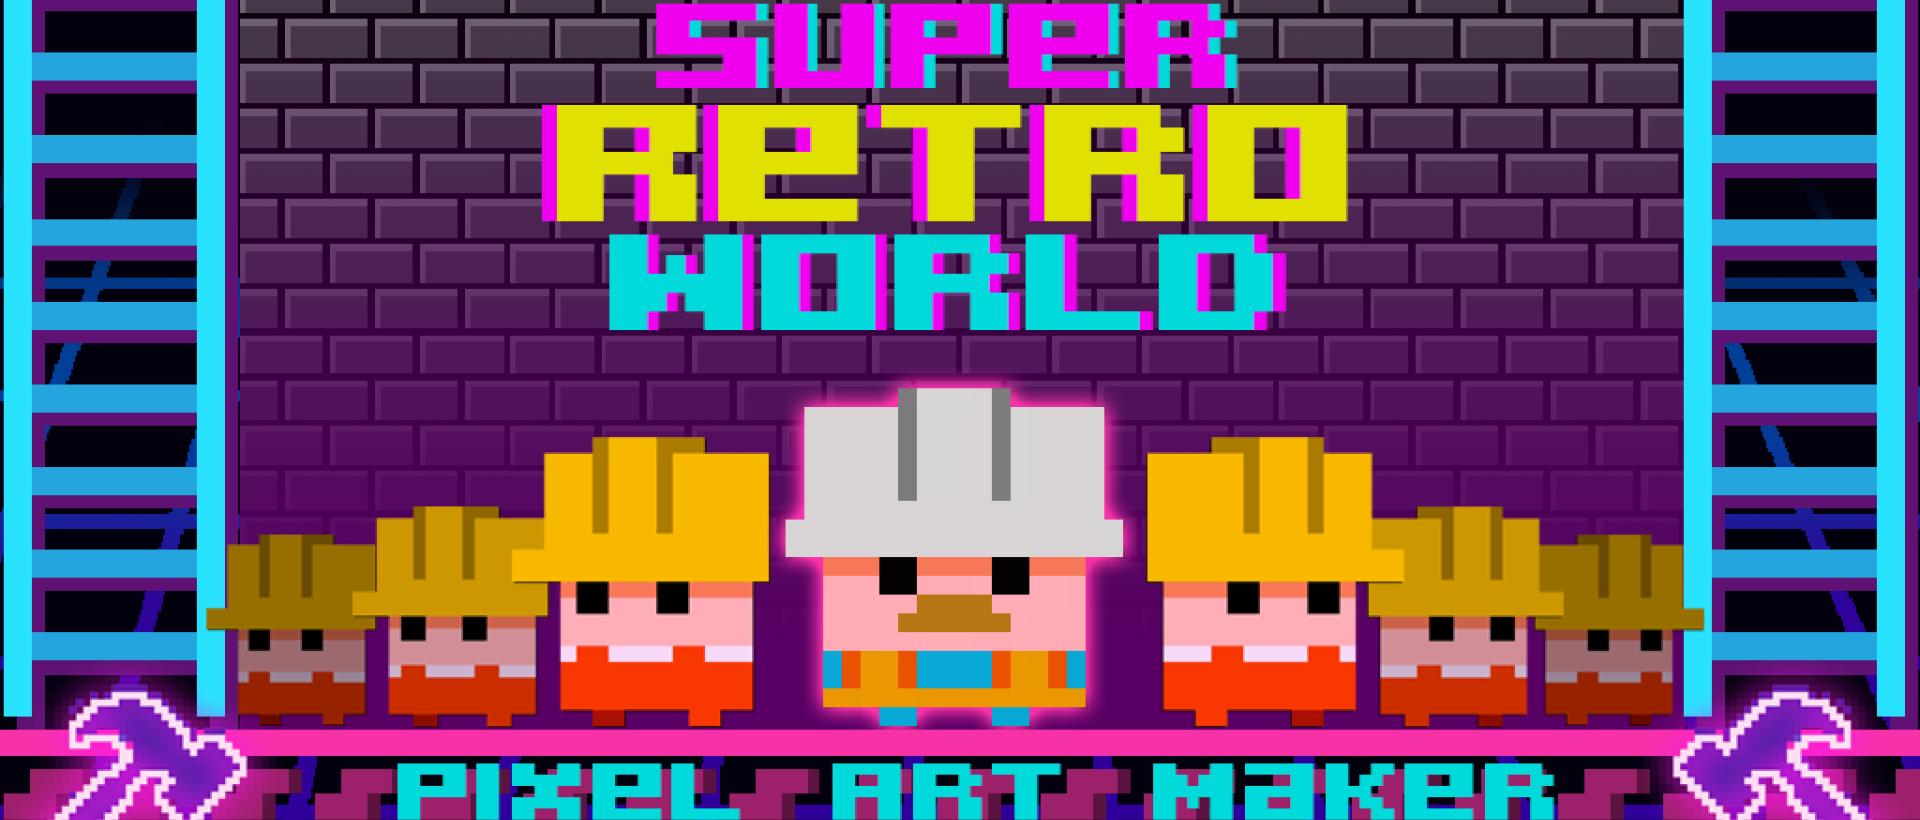 Super Retro World: Pixel Art Maker